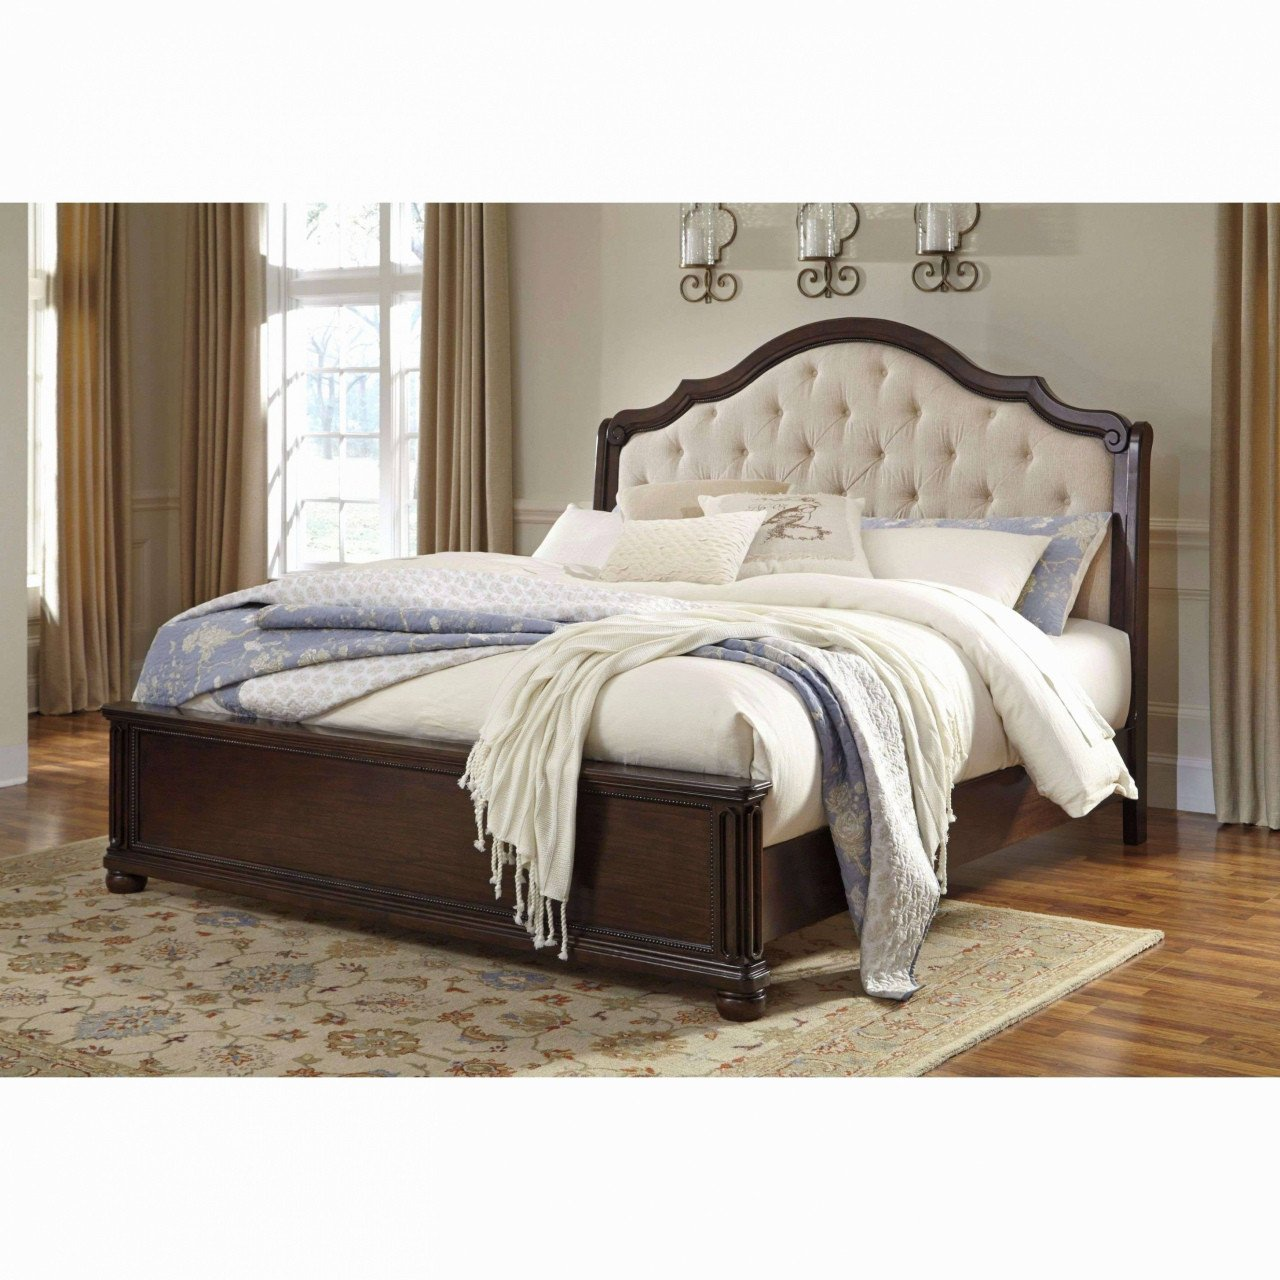 Bedroom Set California King Luxury Cal King Bedroom Sets — Procura Home Blog